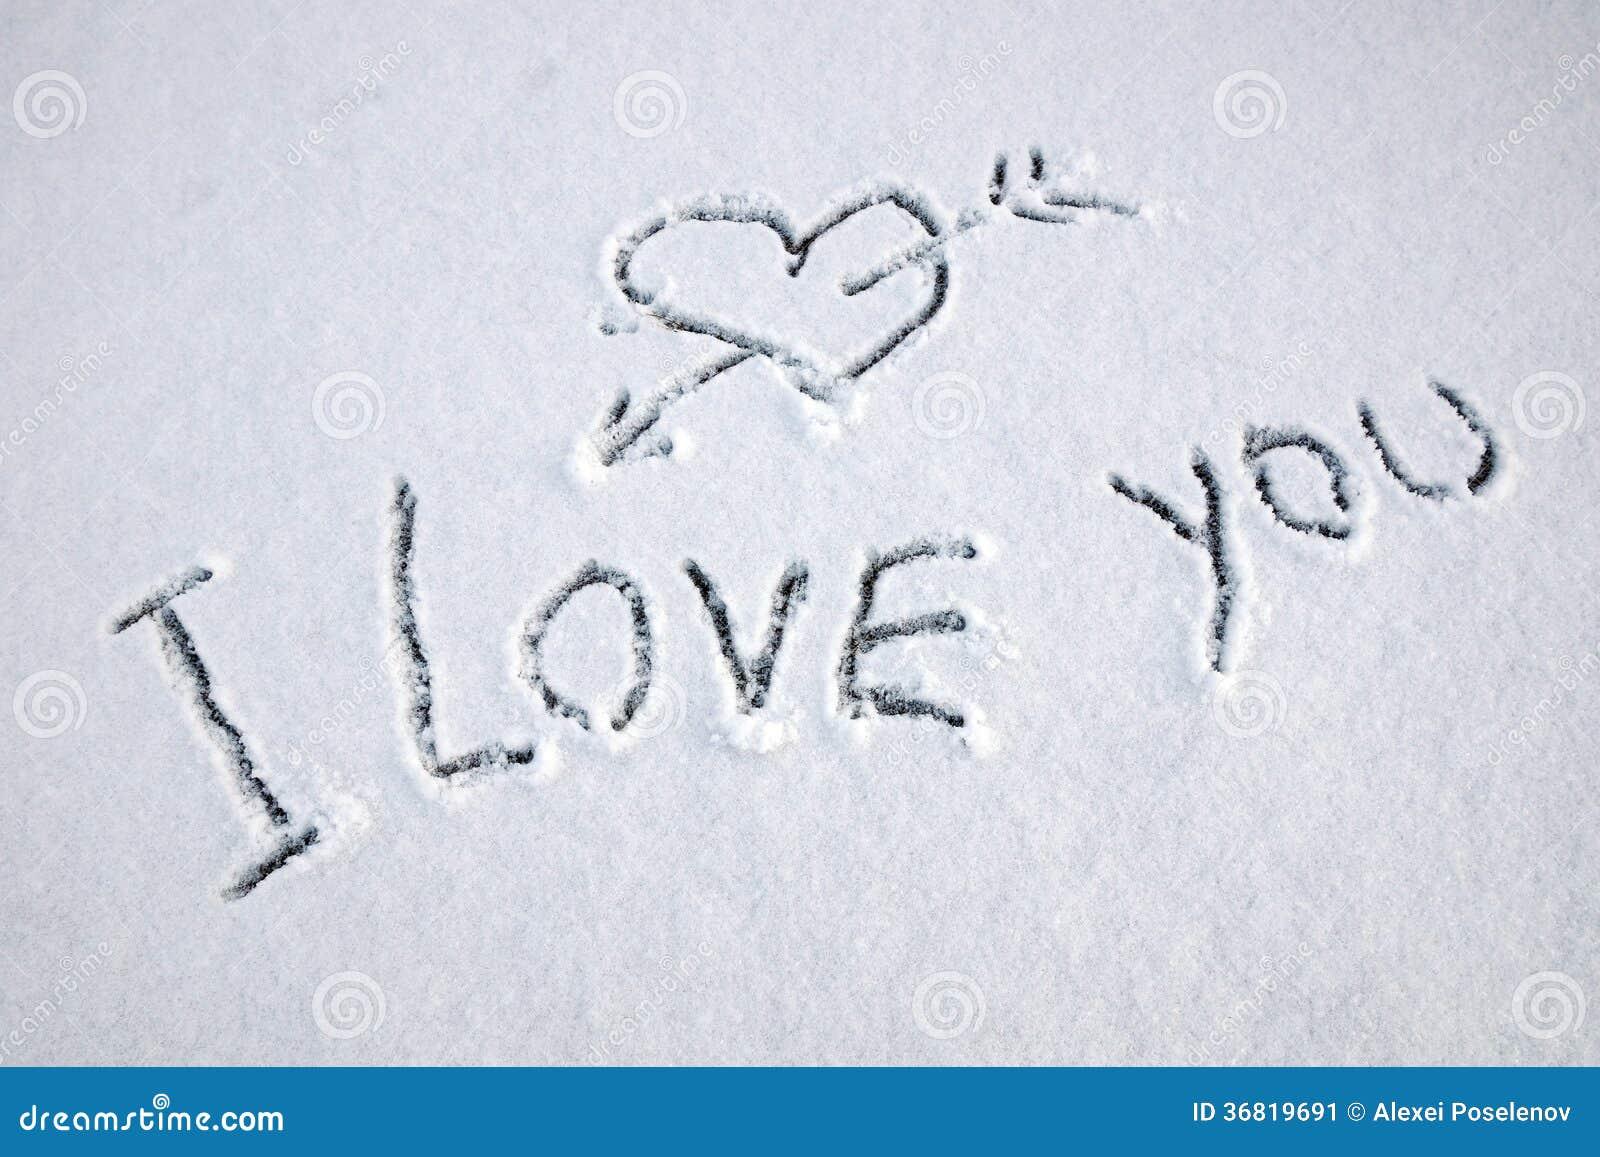 I Love You Imágenes De Stock I Love You Fotos De Stock: I Love You Text Written On Snow Stock Image